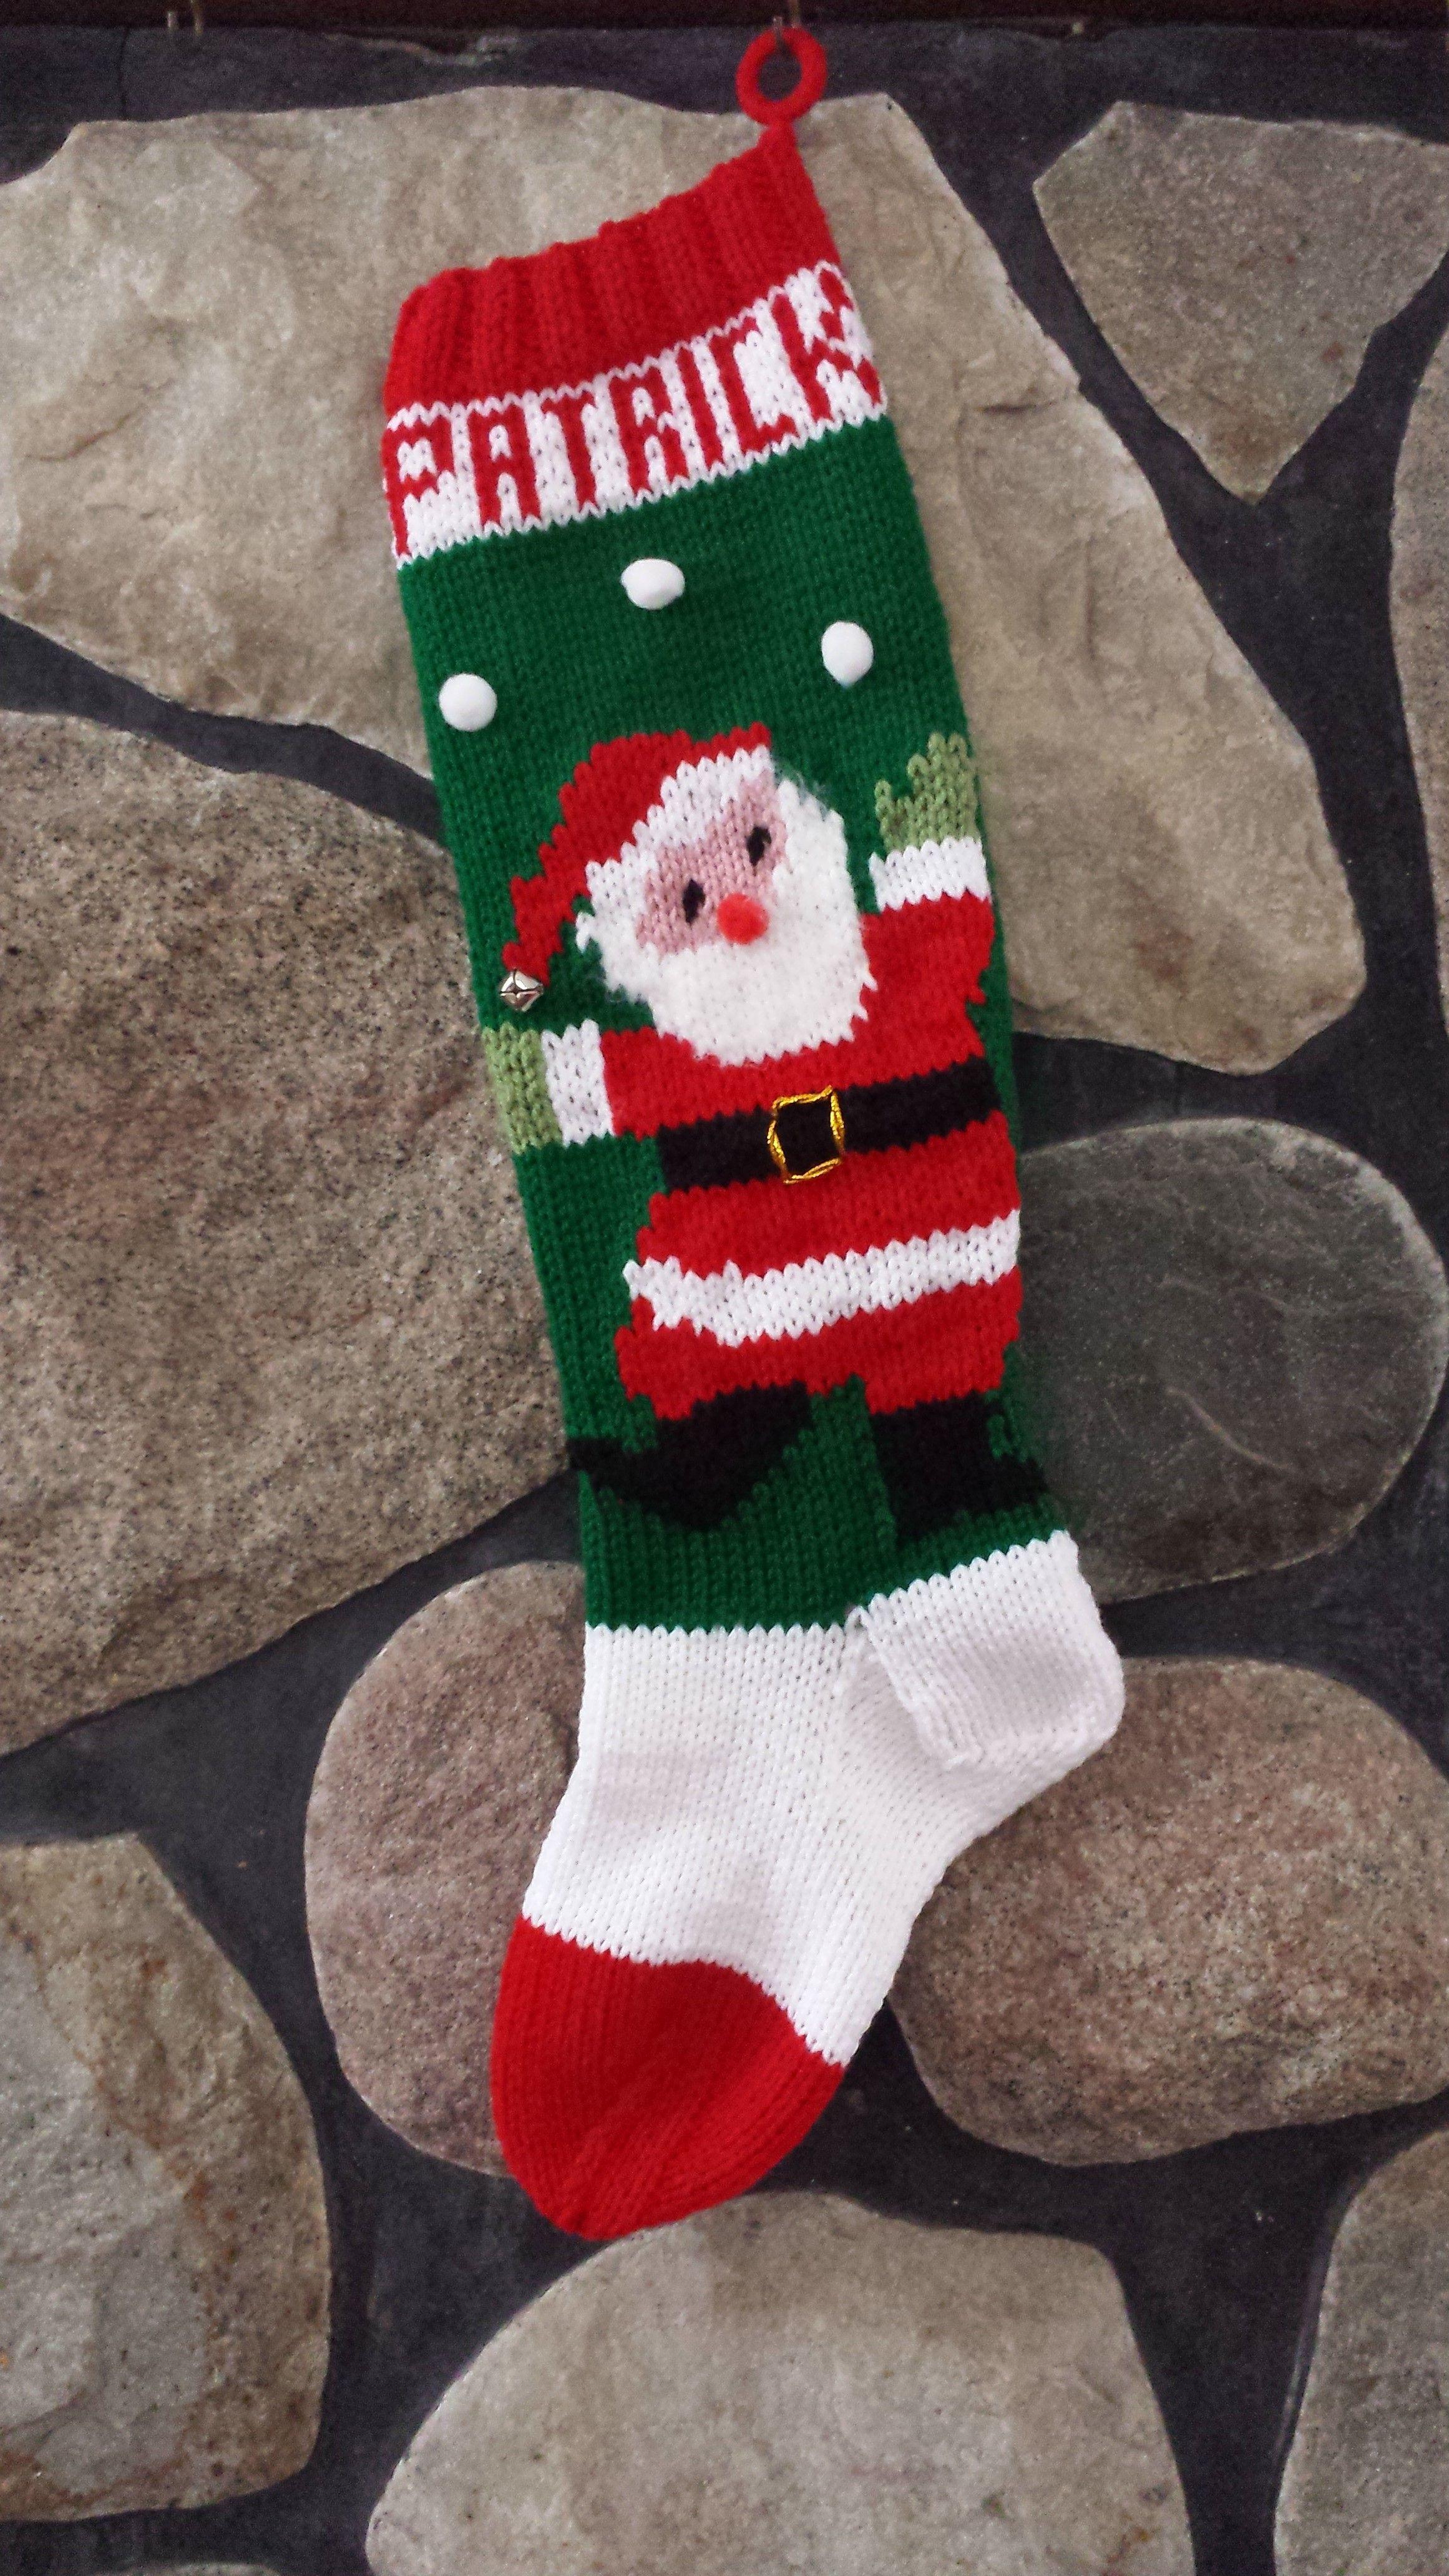 1 KNiT \u2022 Christmas STOCKING Patterns \u2022 Vintage 1970s \u2022 Xmas Instant Download \u2022 2 Patterns \u2022 Twas The Night Before Christmas 1 CROCHET